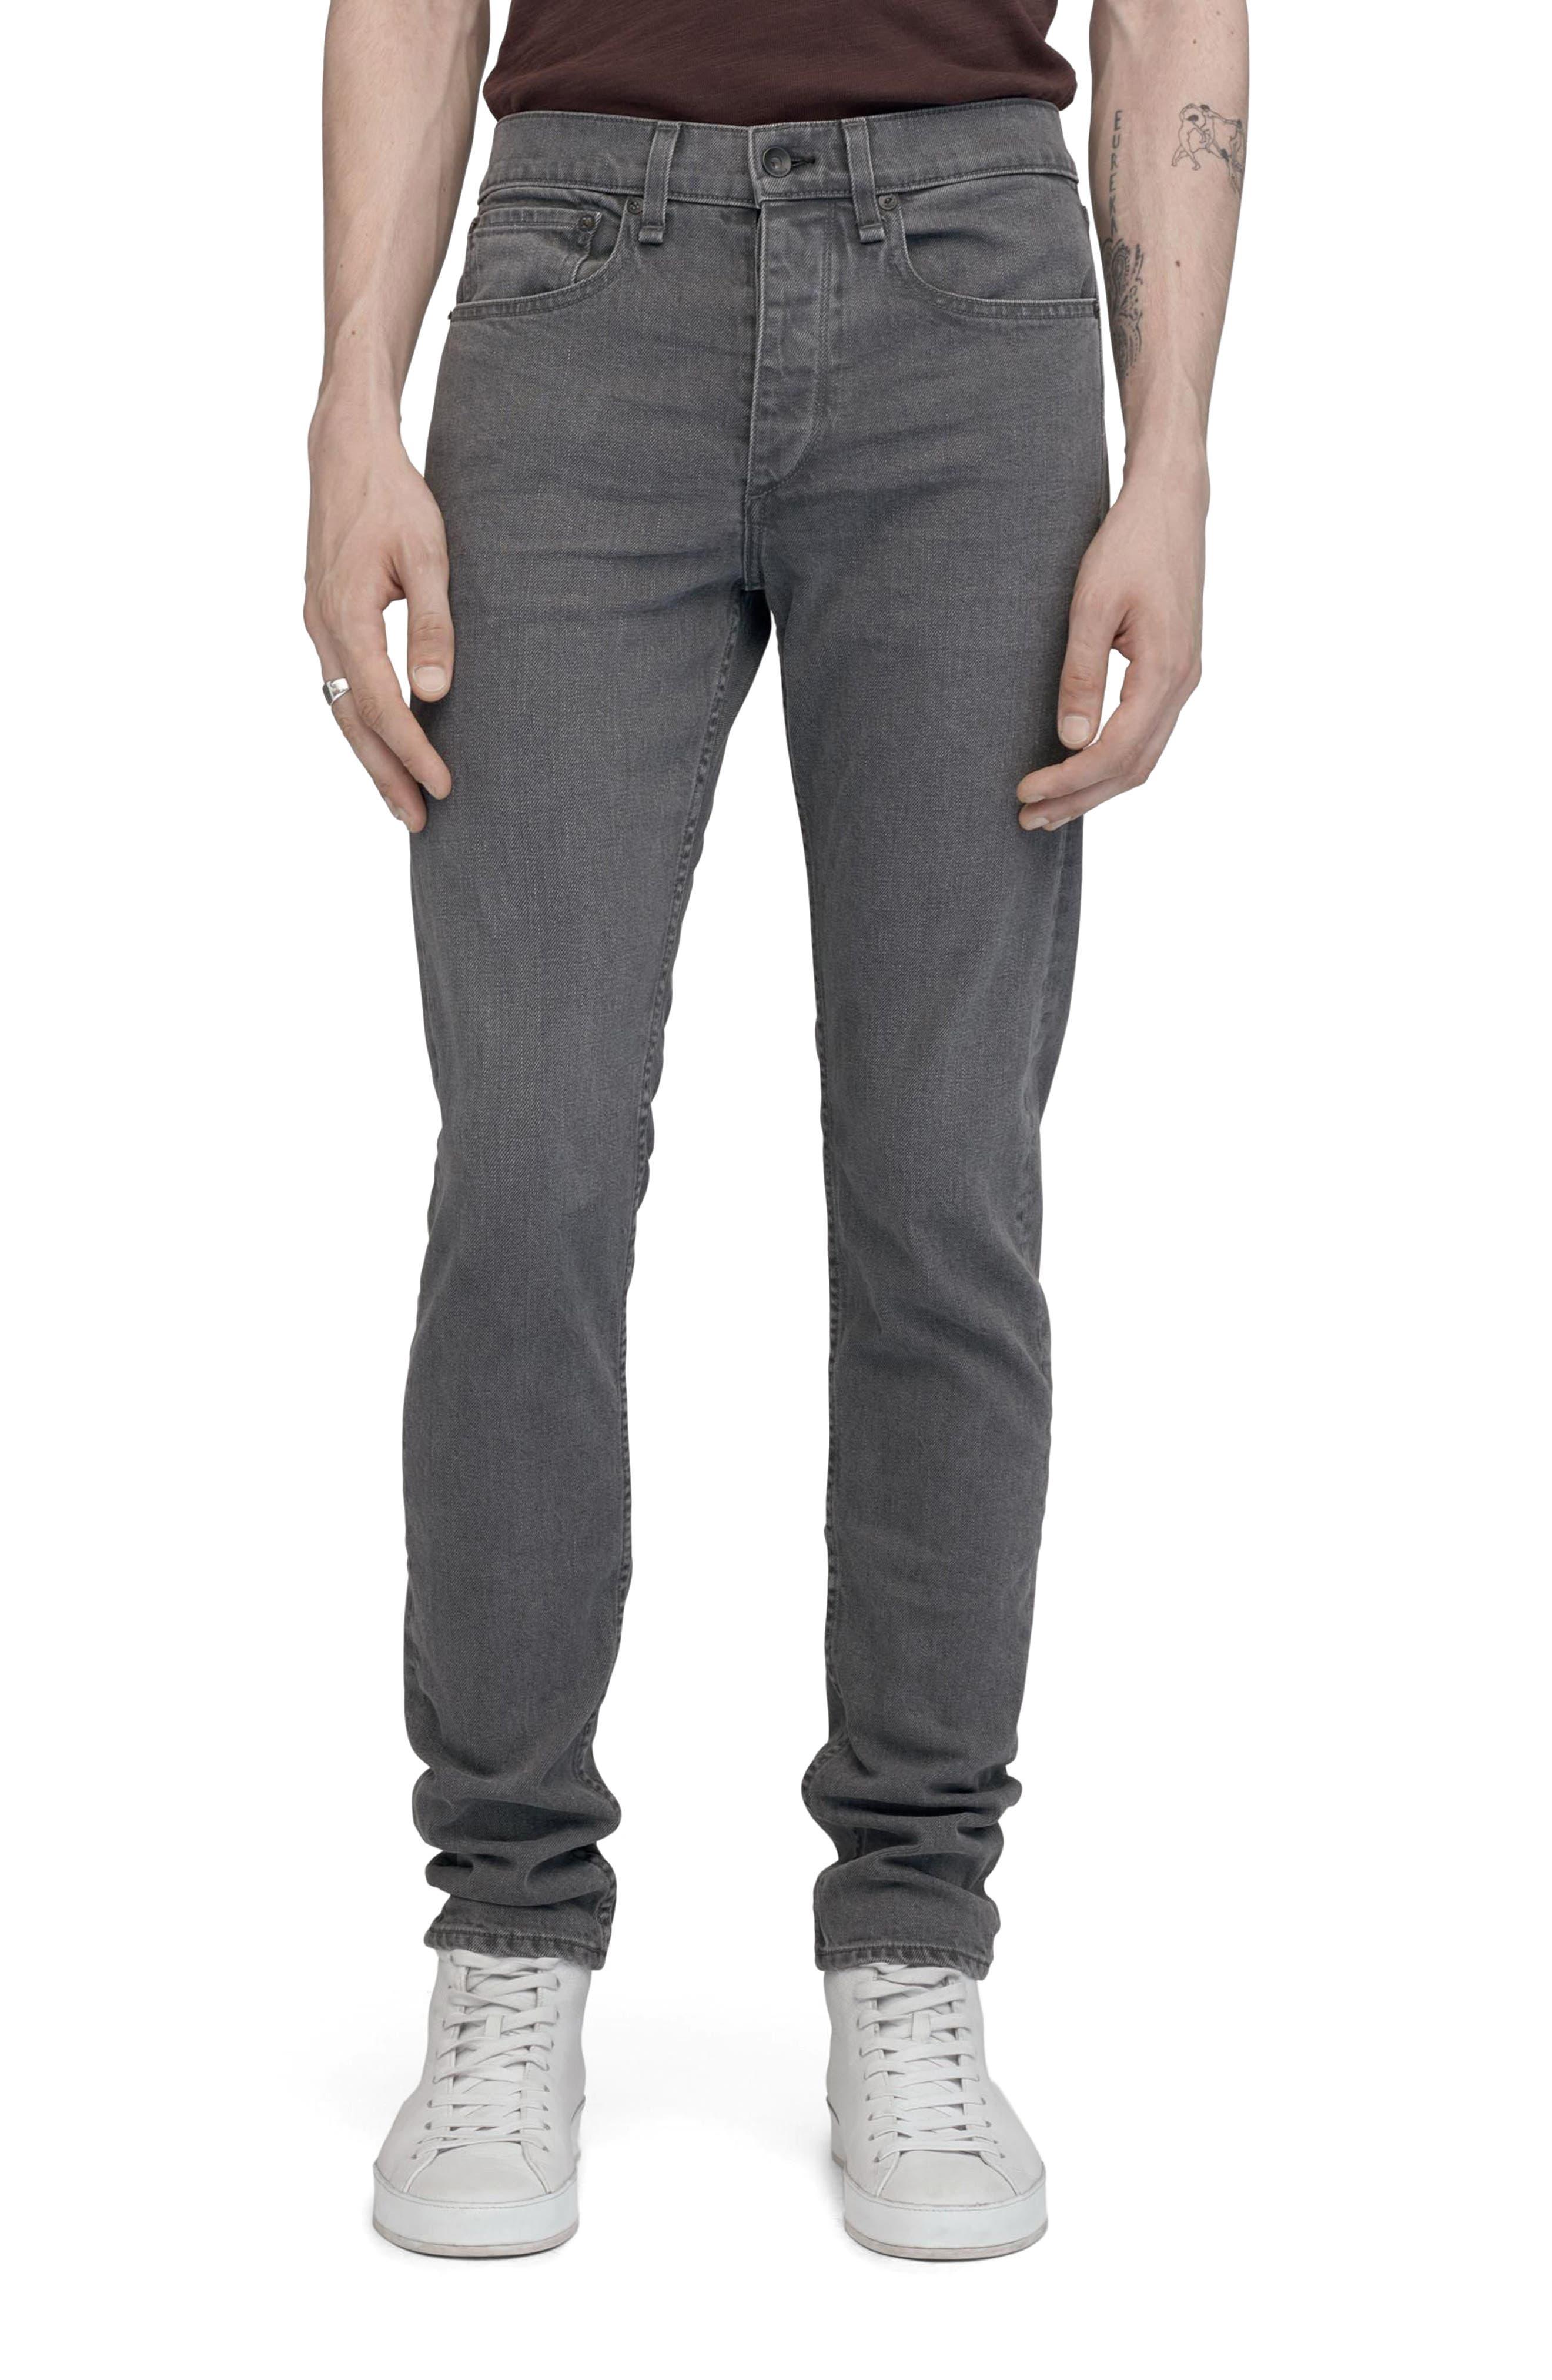 Alternate Image 1 Selected - rag & bone Fit 1 Skinny Fit Jeans (Vesuvio)